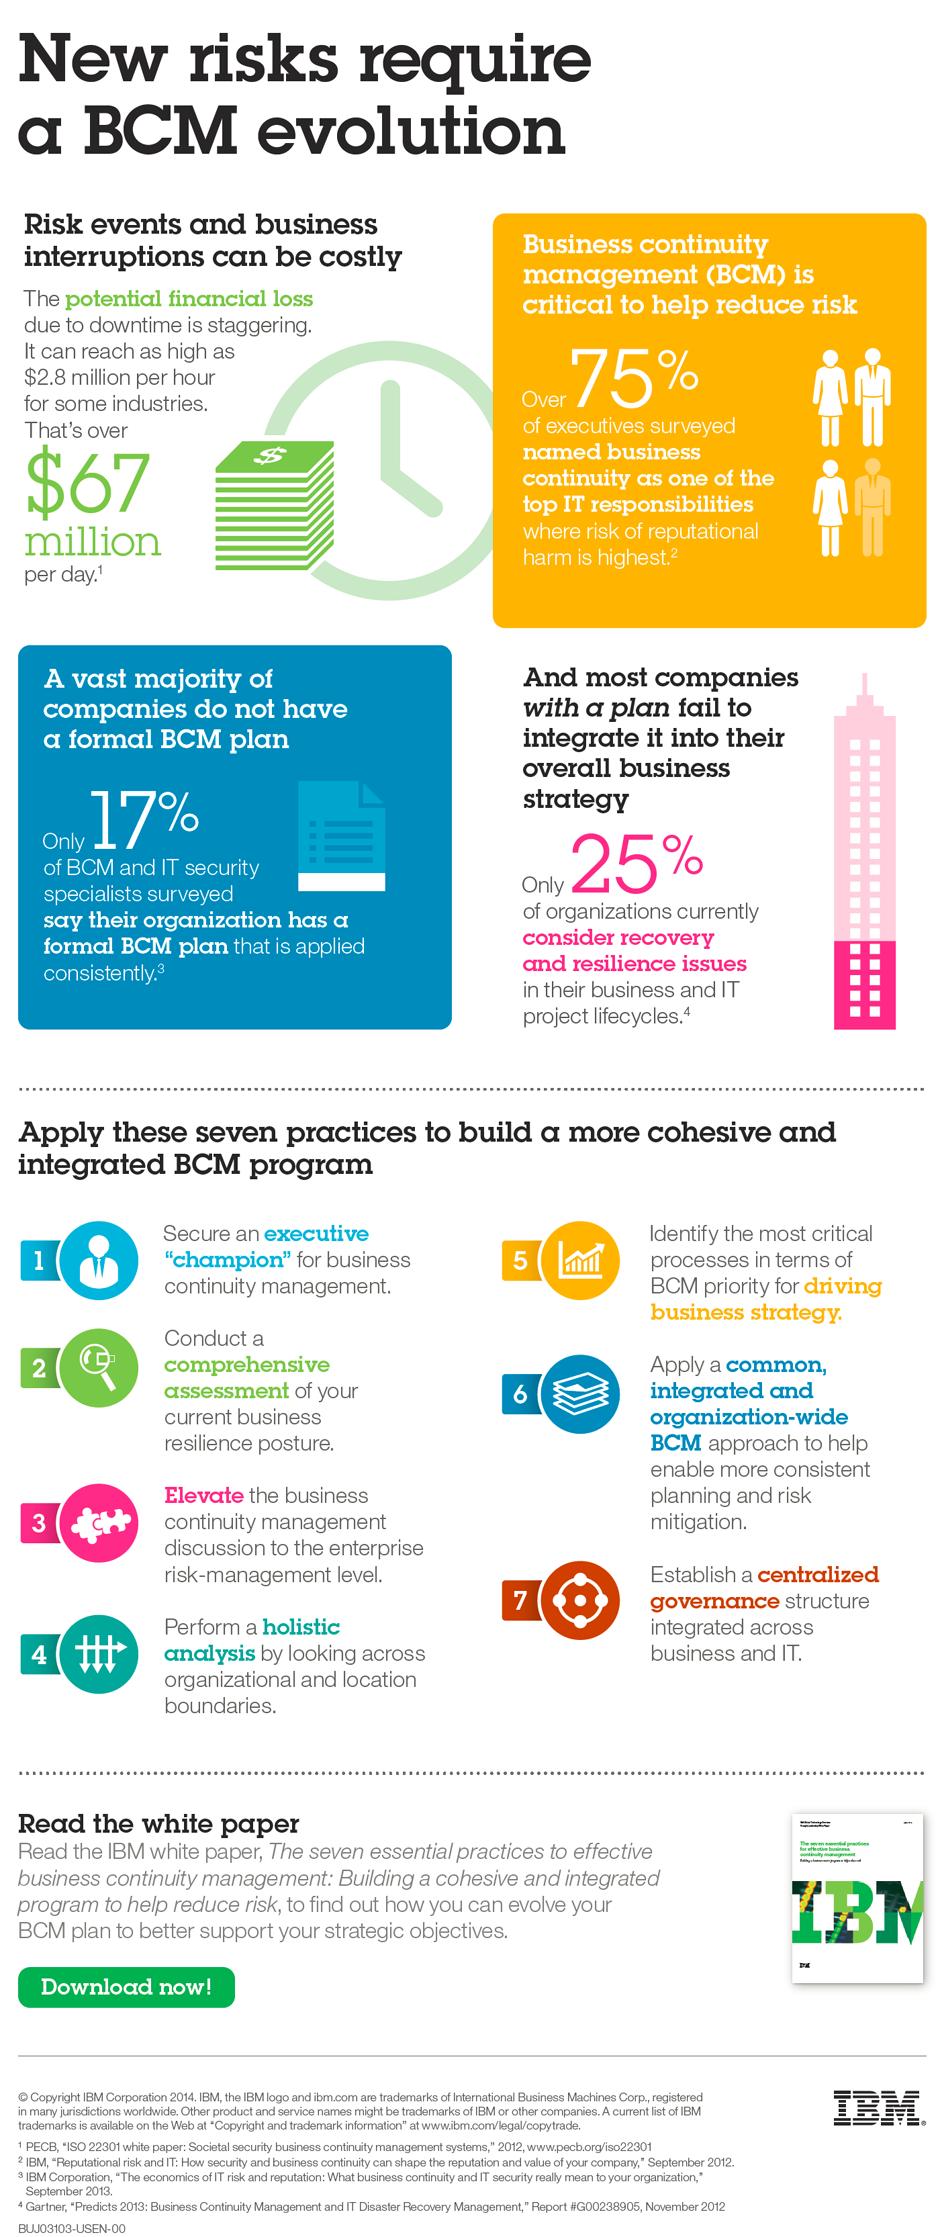 7 essential practices for business continuity management 7 essential practices for business continuity management xflitez Choice Image